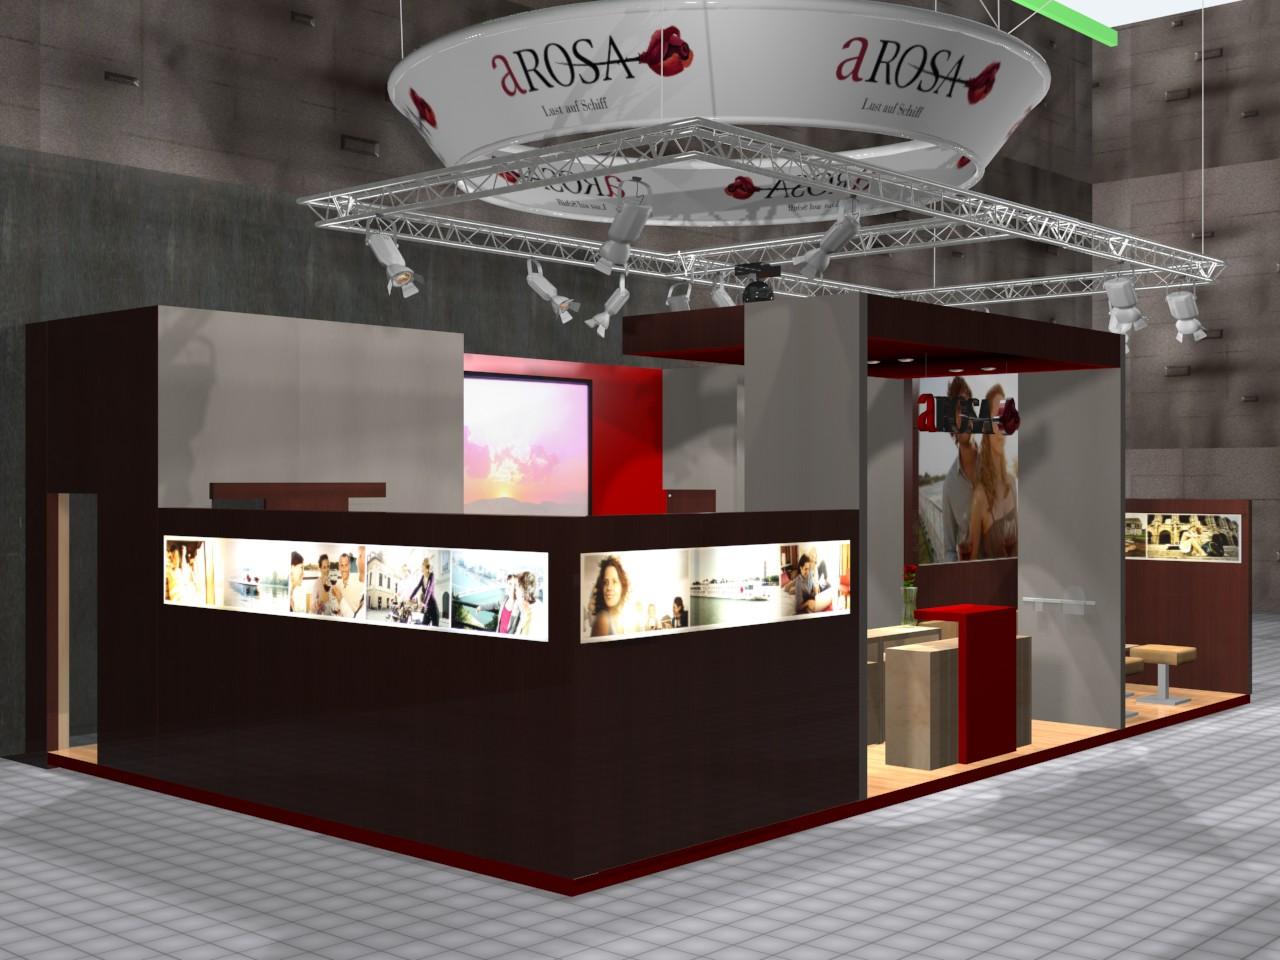 Arosa ITB 2012_4.1.002